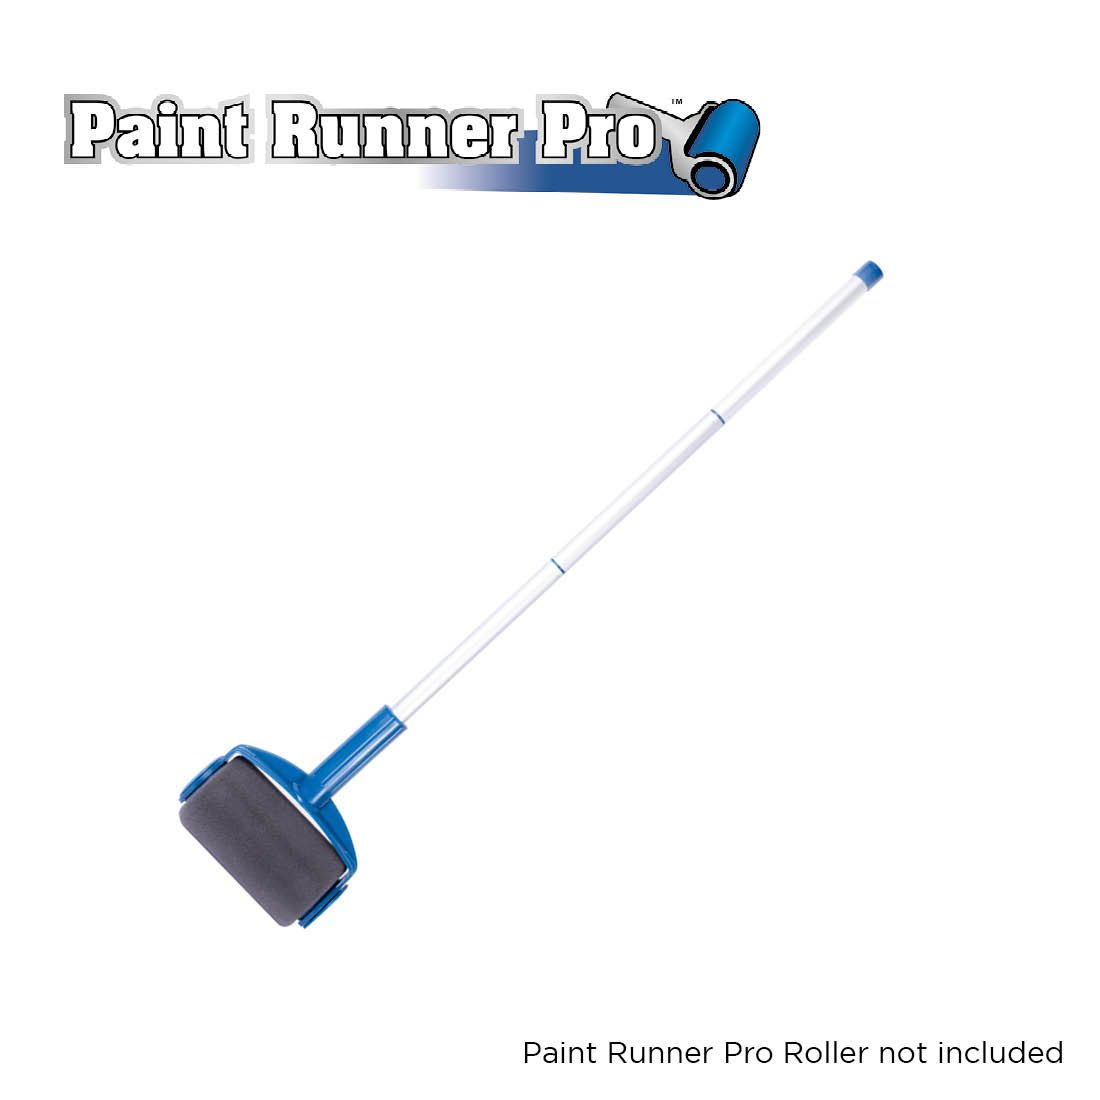 Paint Runner Pro Extension Pole